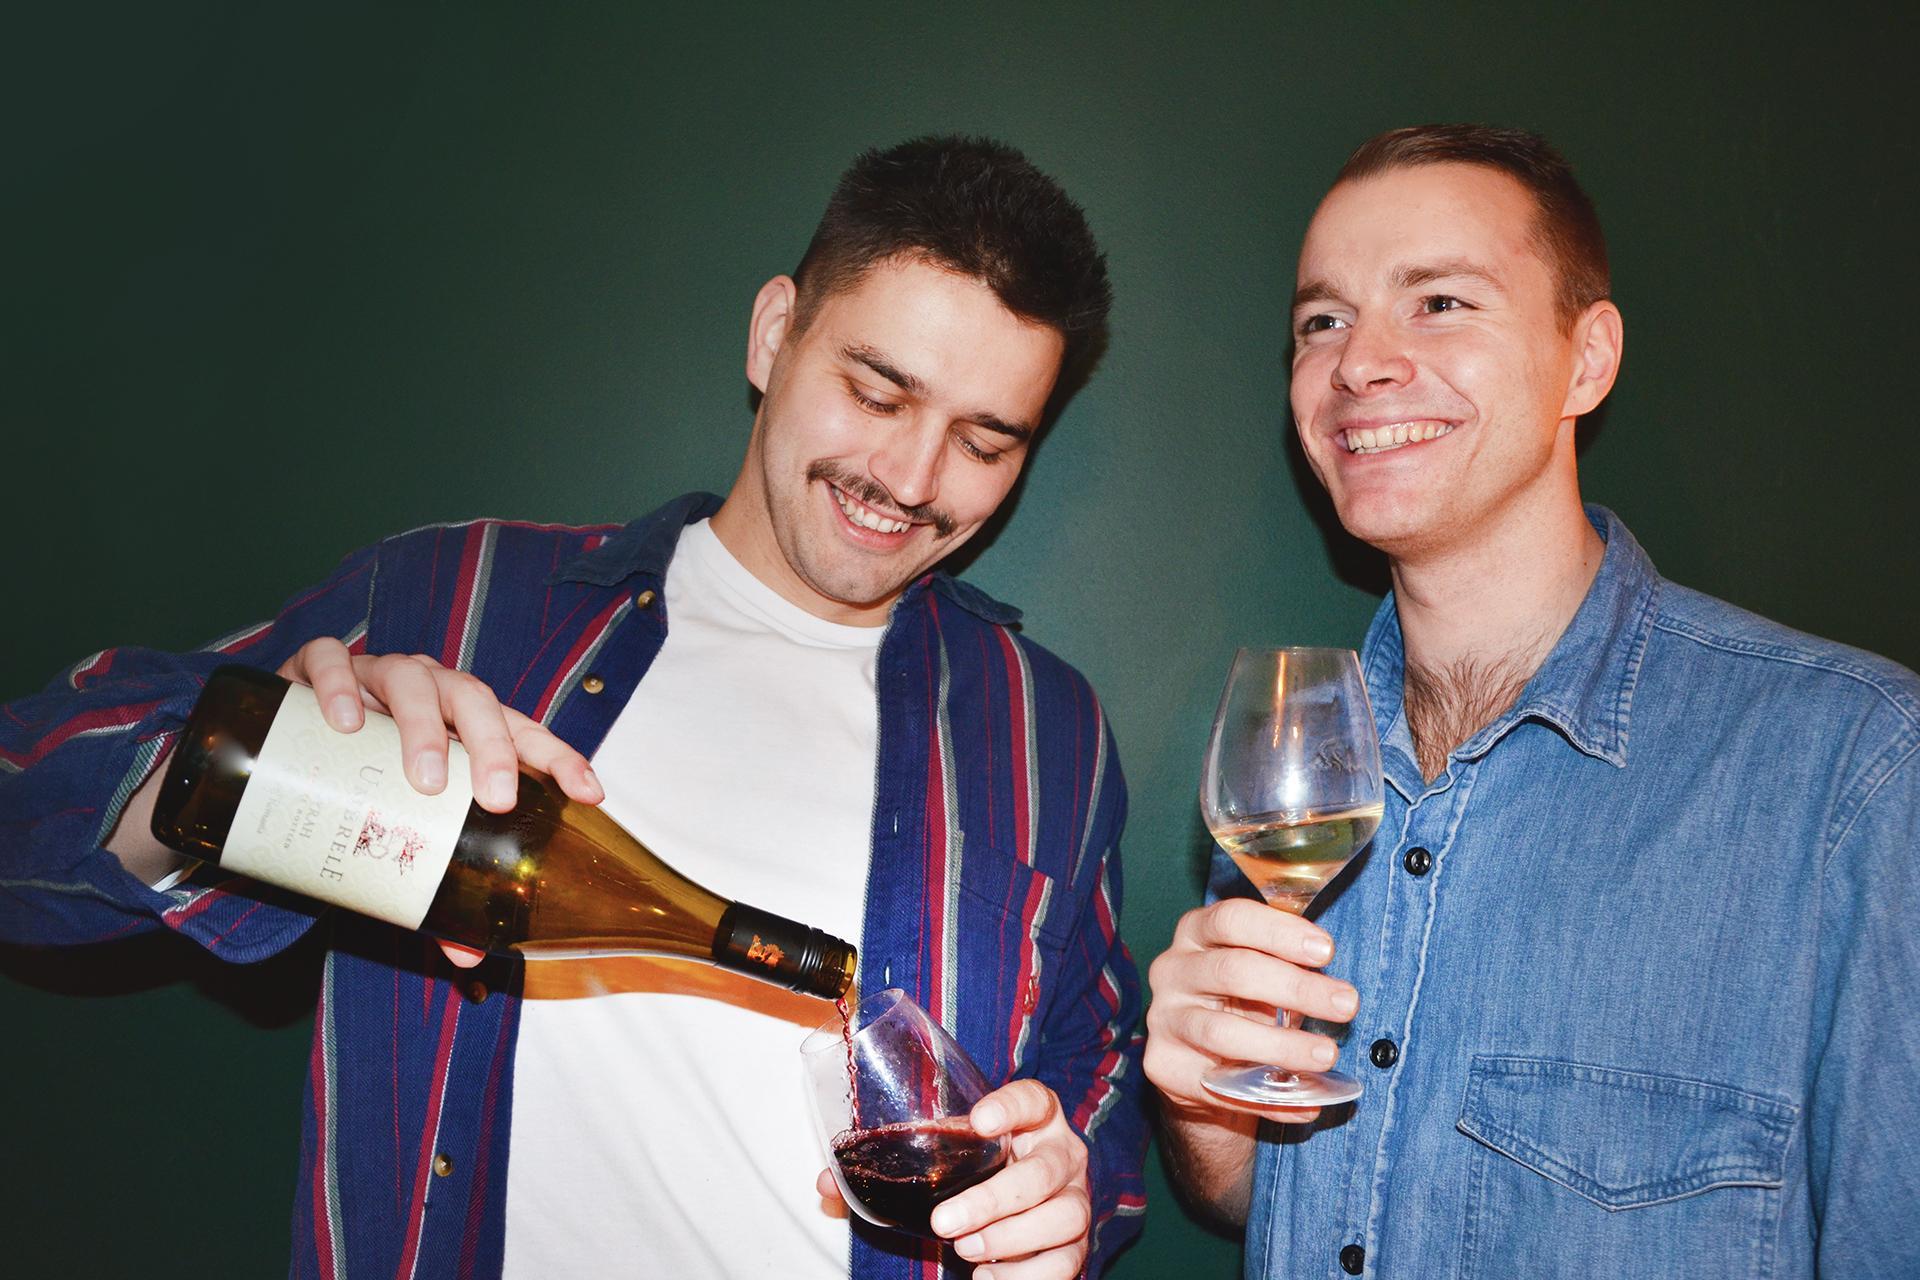 Gleb Petrenko and Jack Blumson, Other World Wines